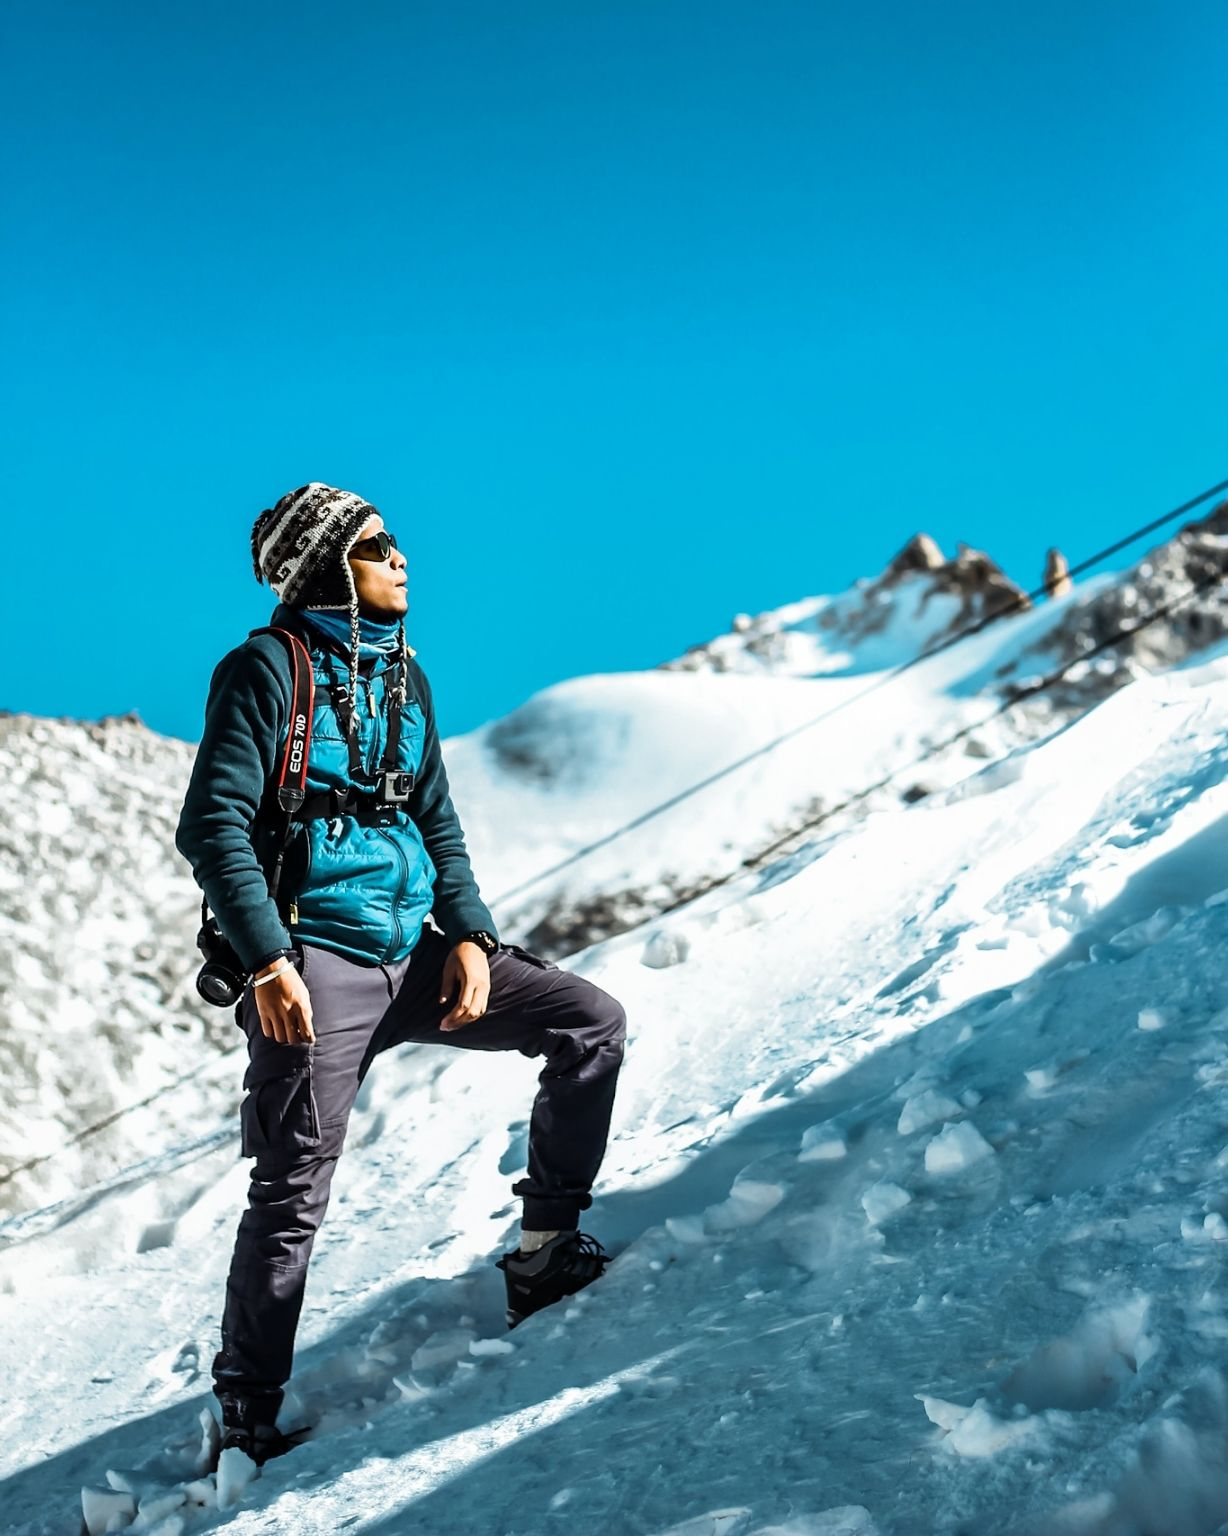 Photo of Ladakh By Alladu Bhaskar